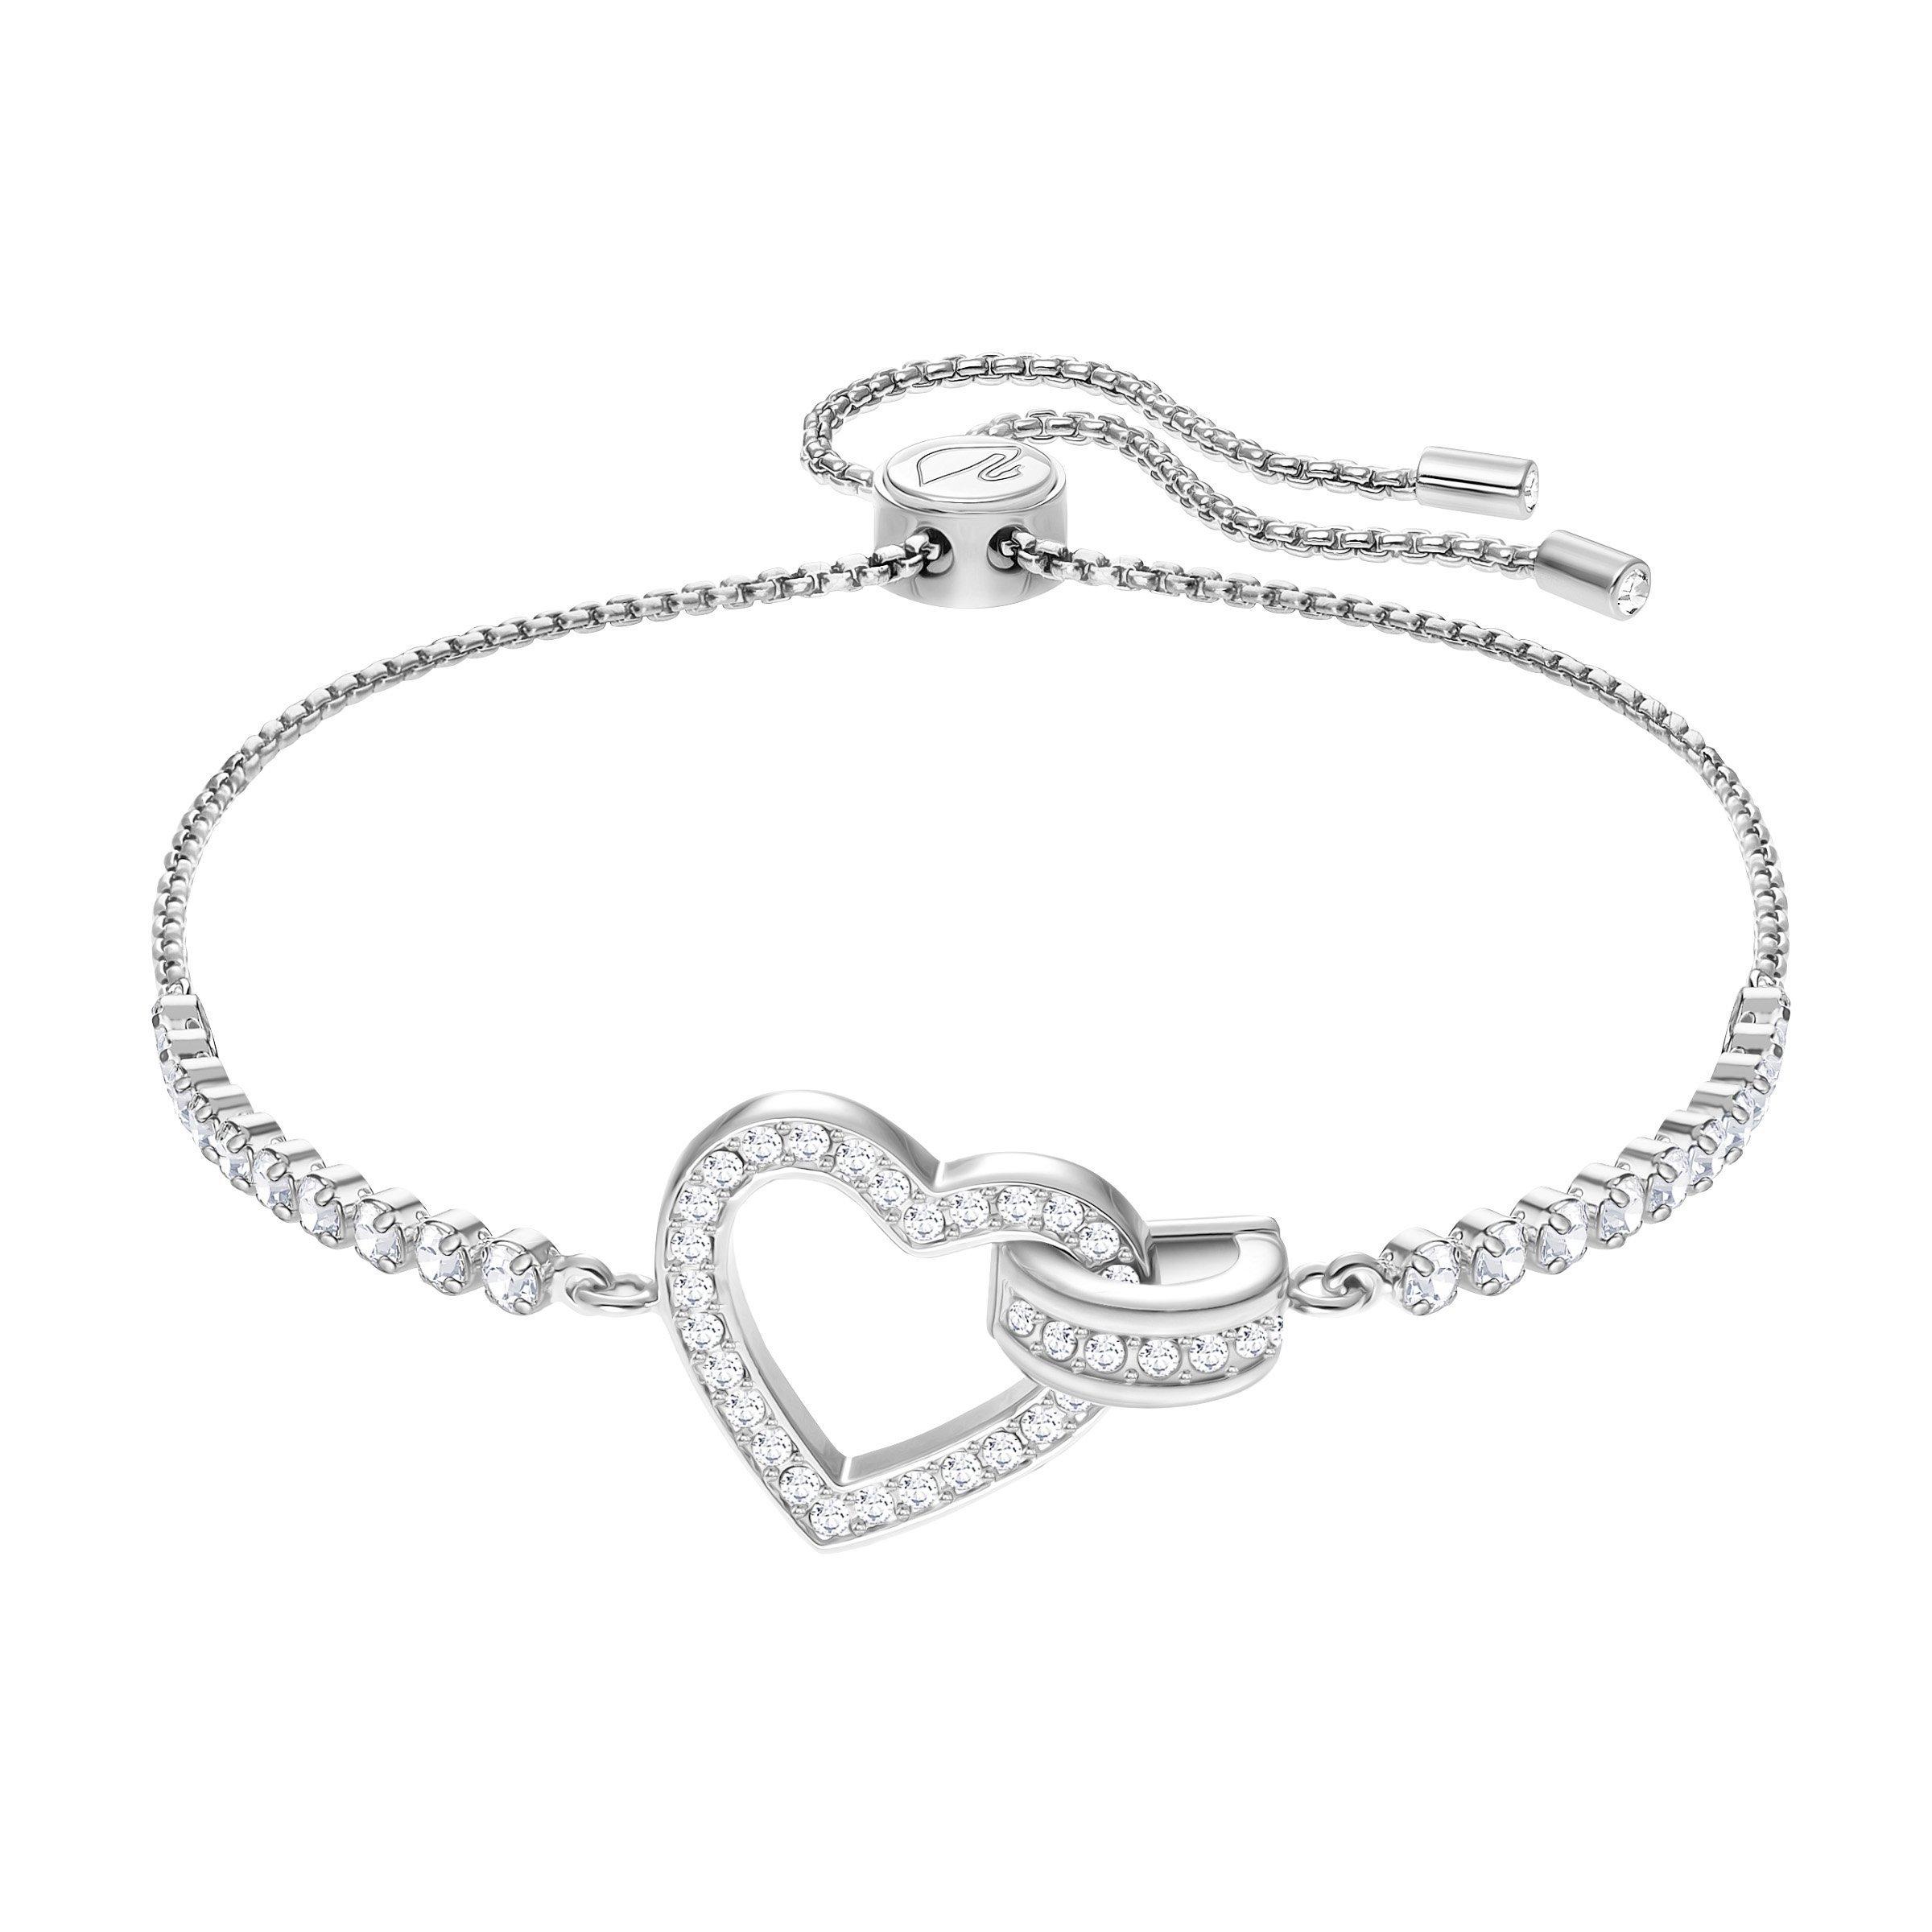 Lovely bracelet Swarovski